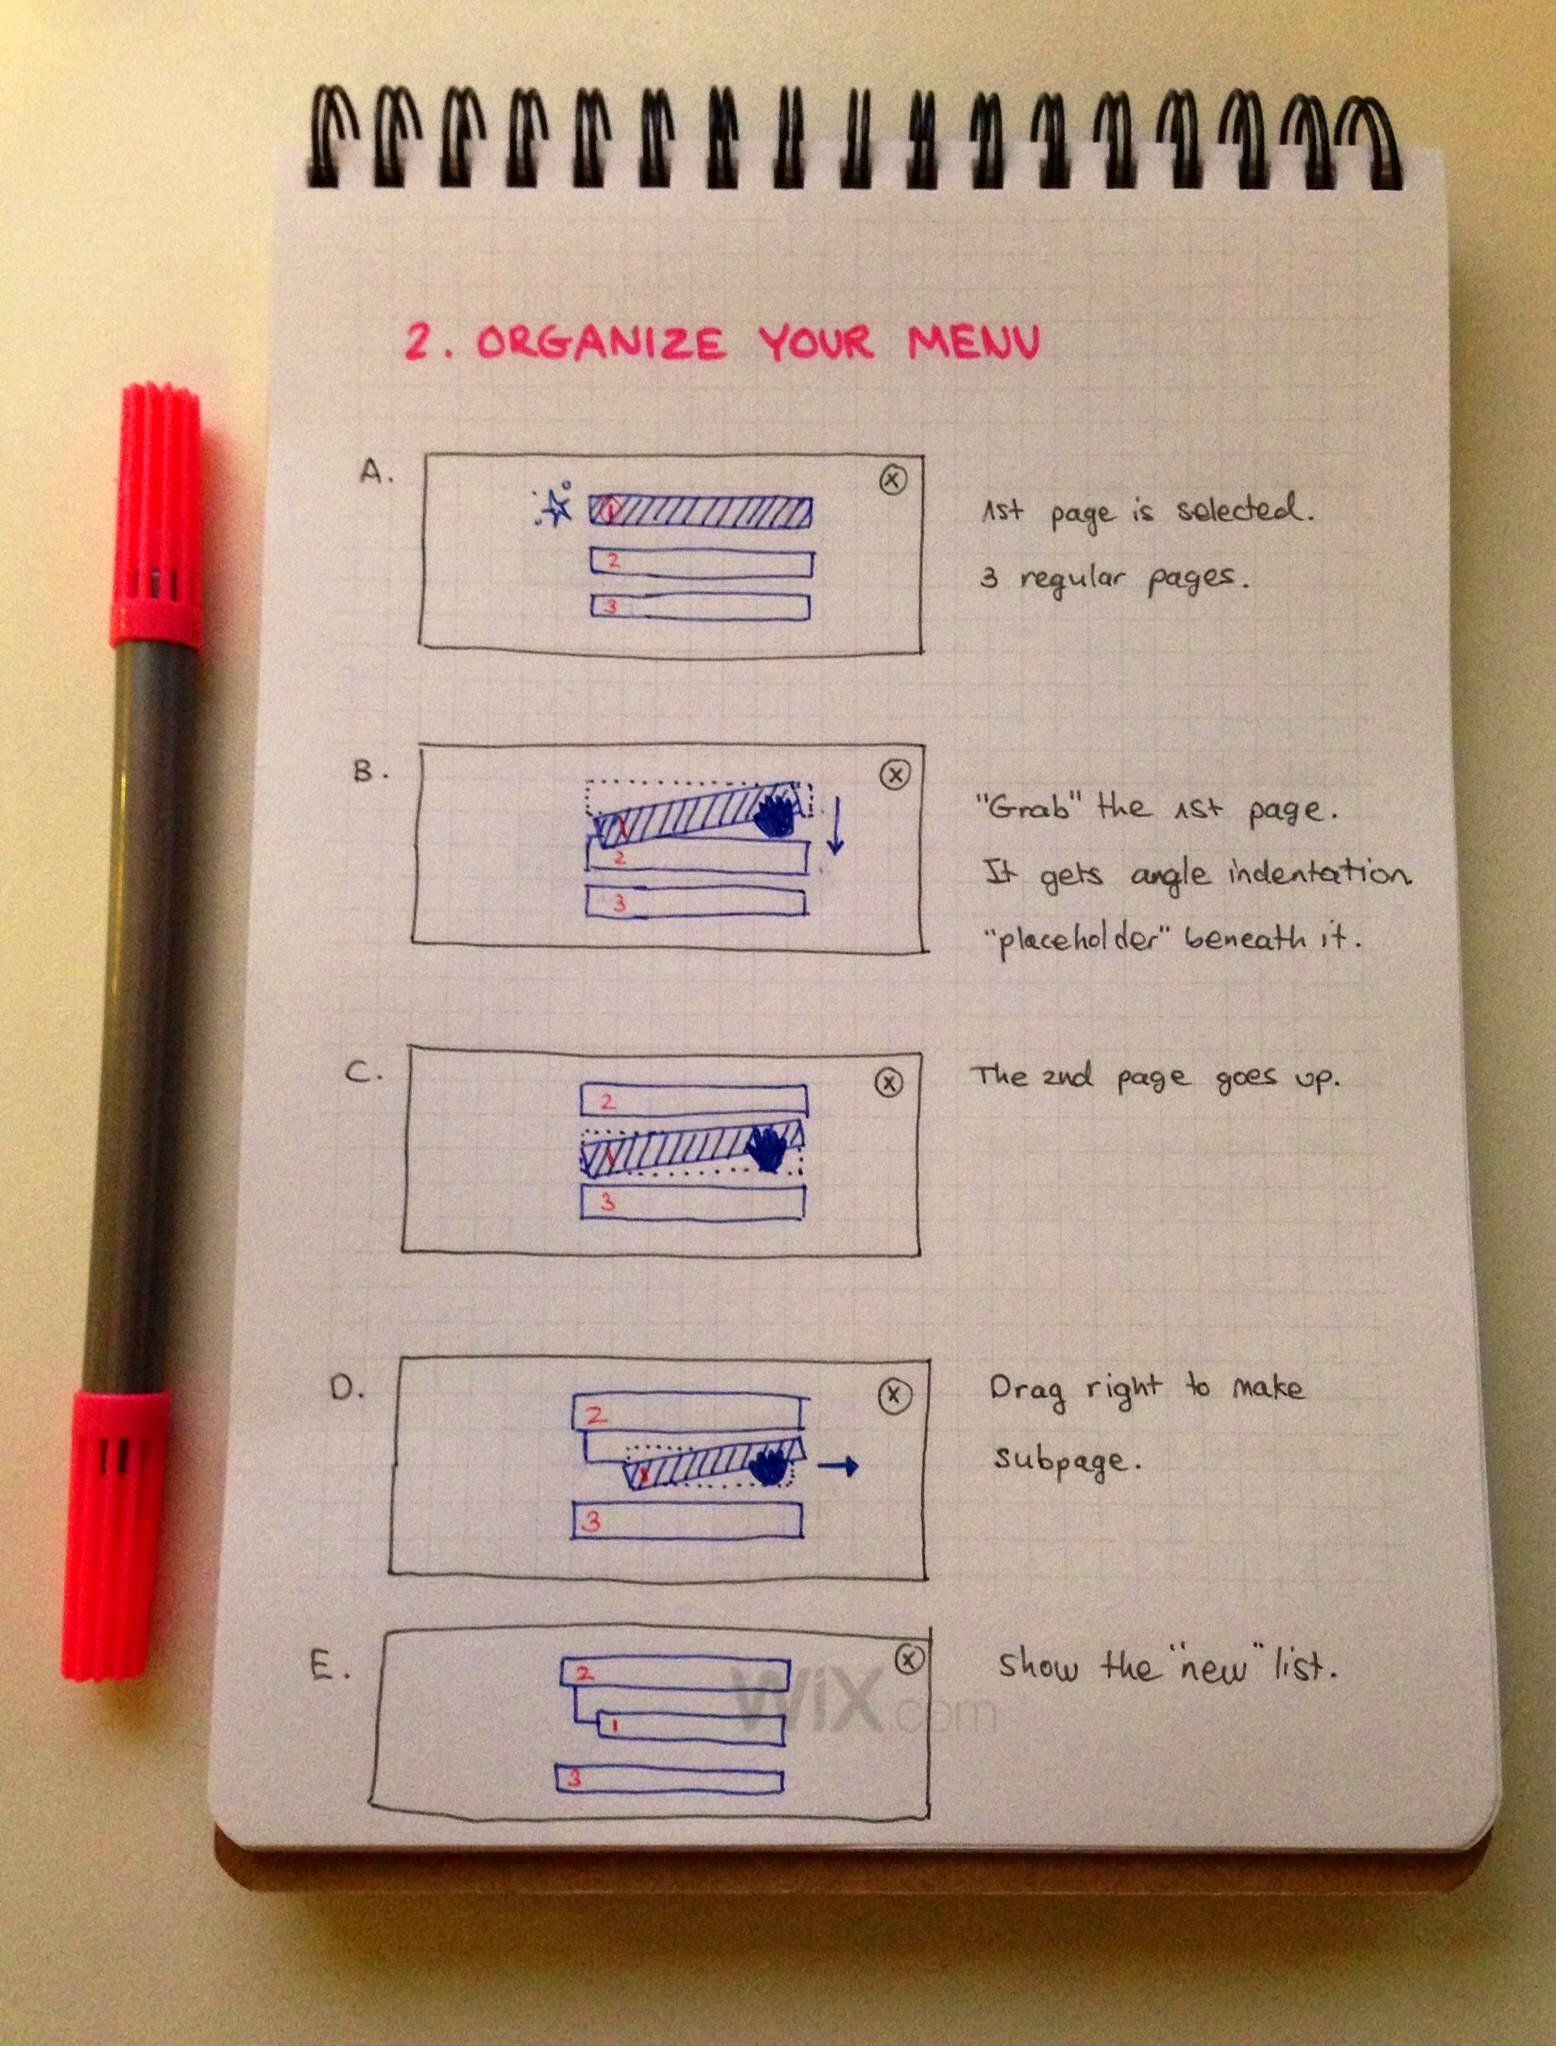 UX design user flows hand-drawn sketch